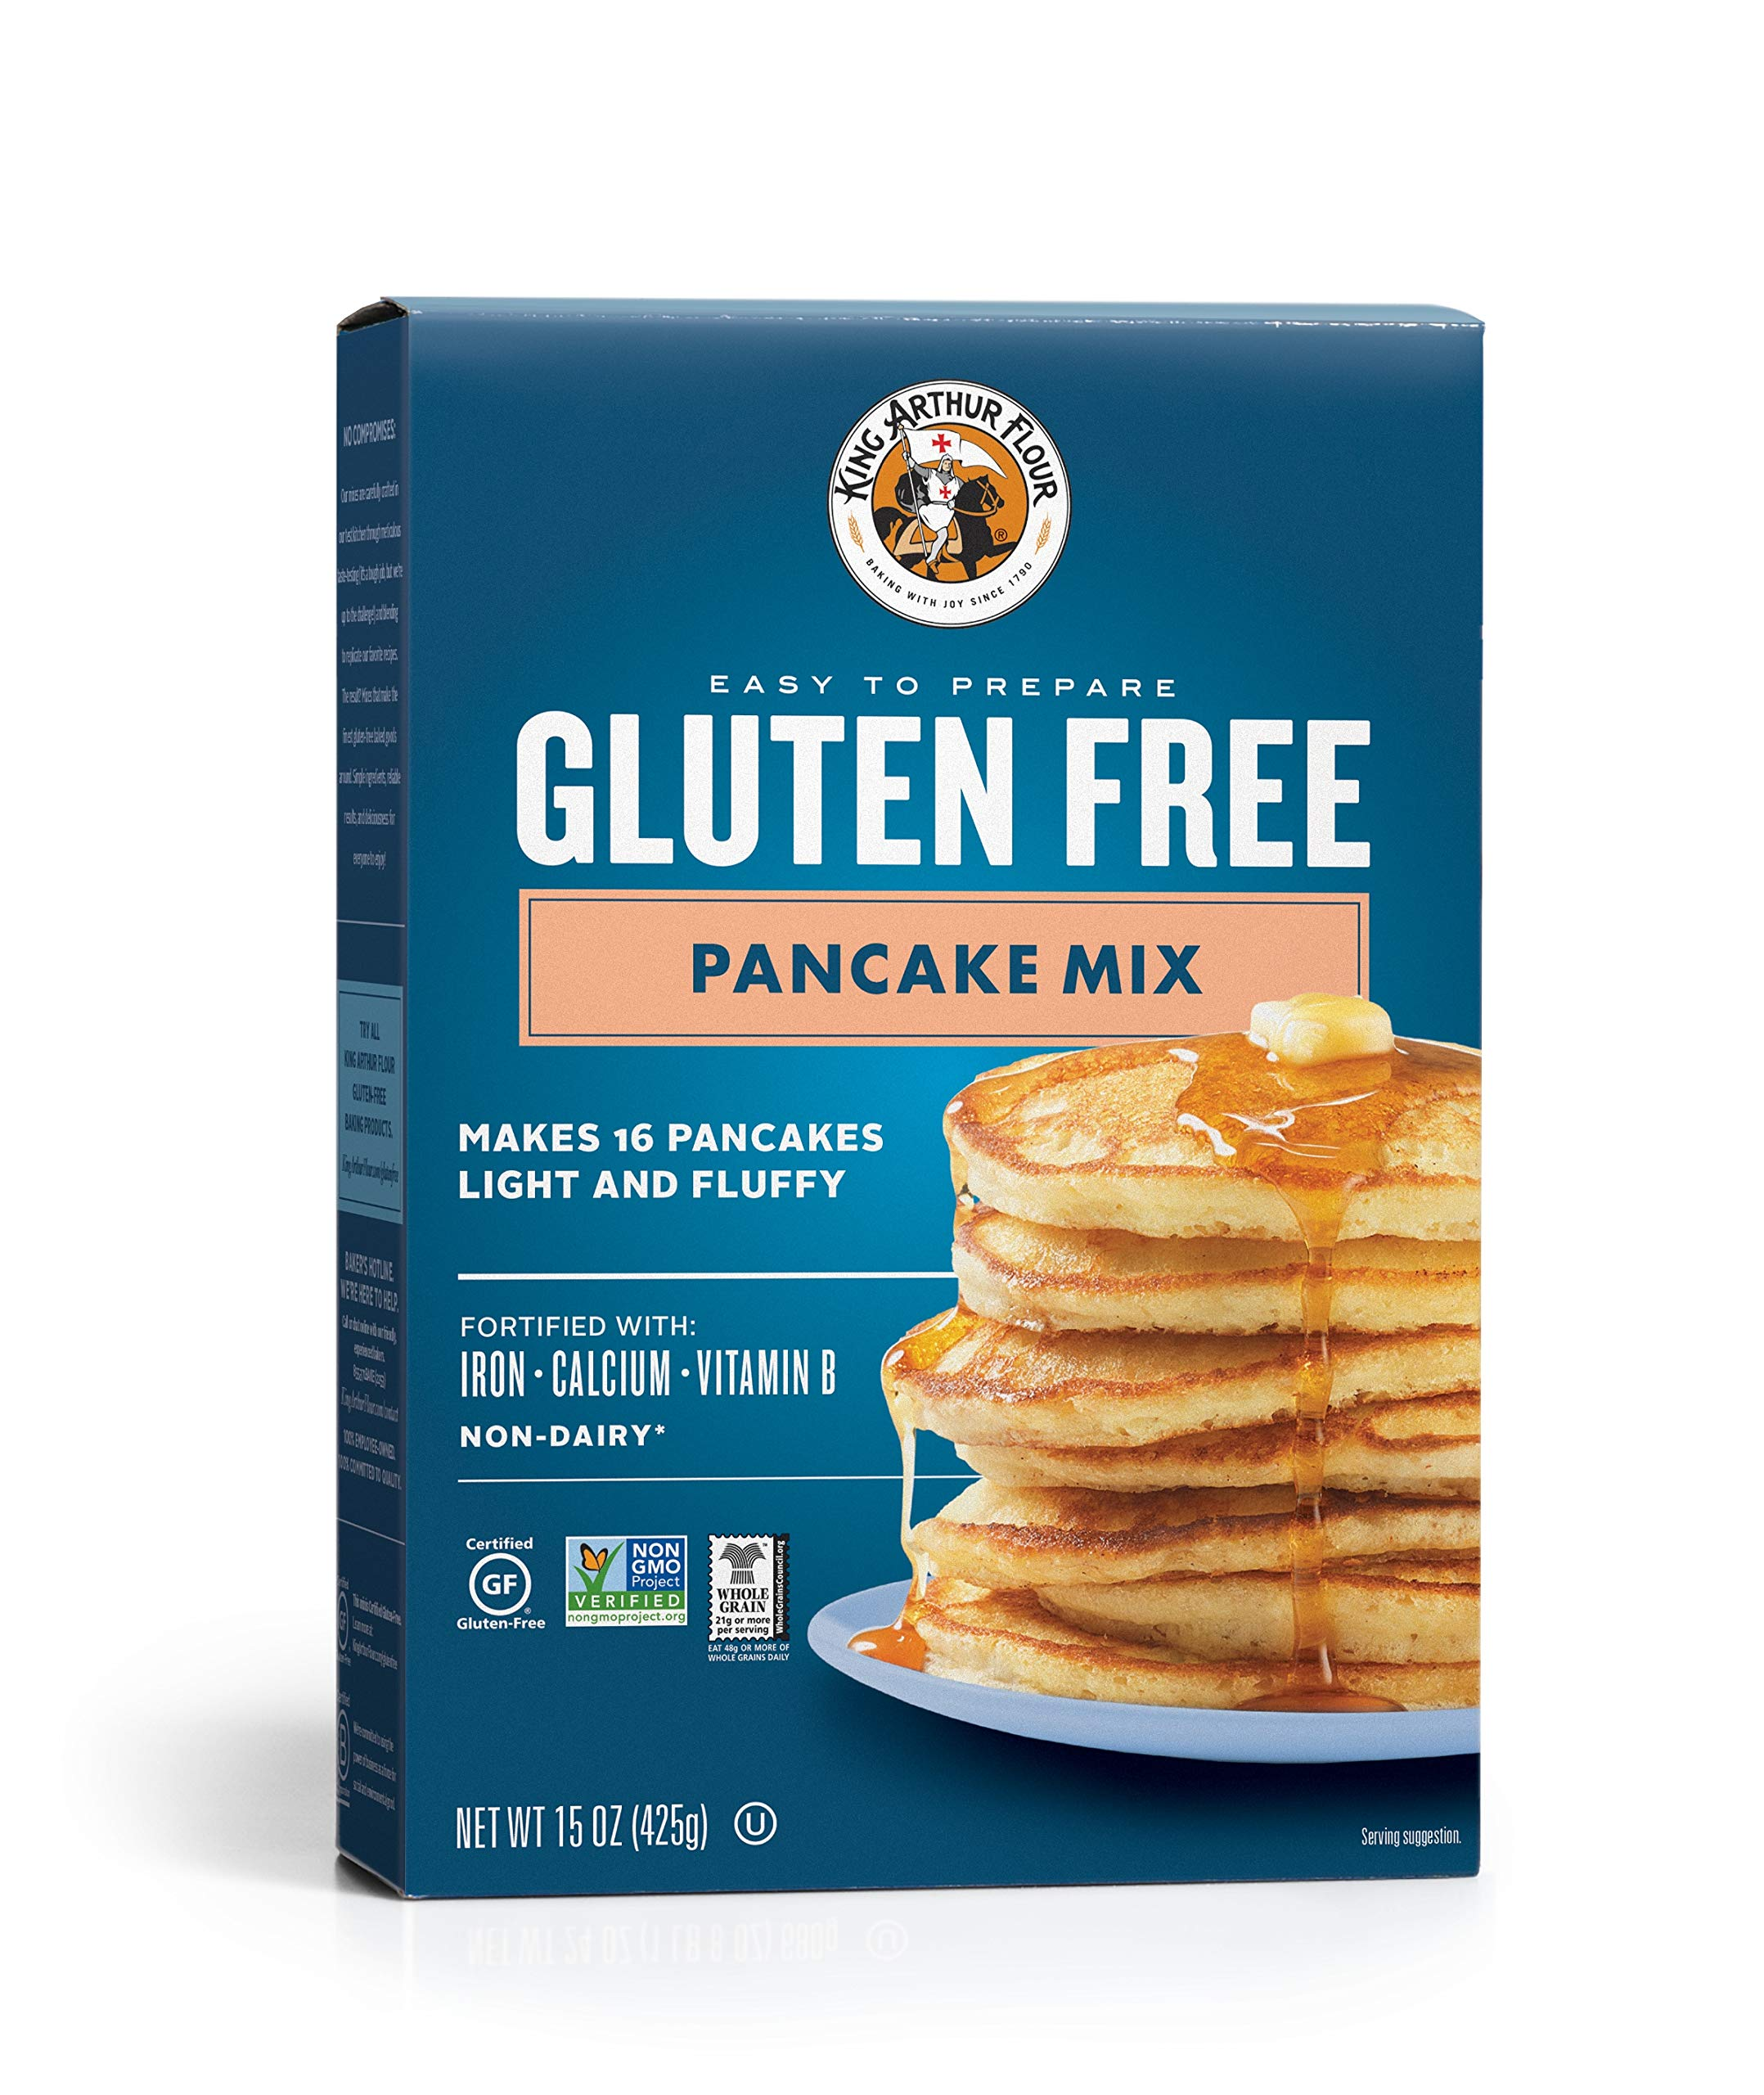 KING ARTHUR FLOUR Gluten Free Pancake Mix, 15 Ounce (Pack of 6) by King Arthur Flour